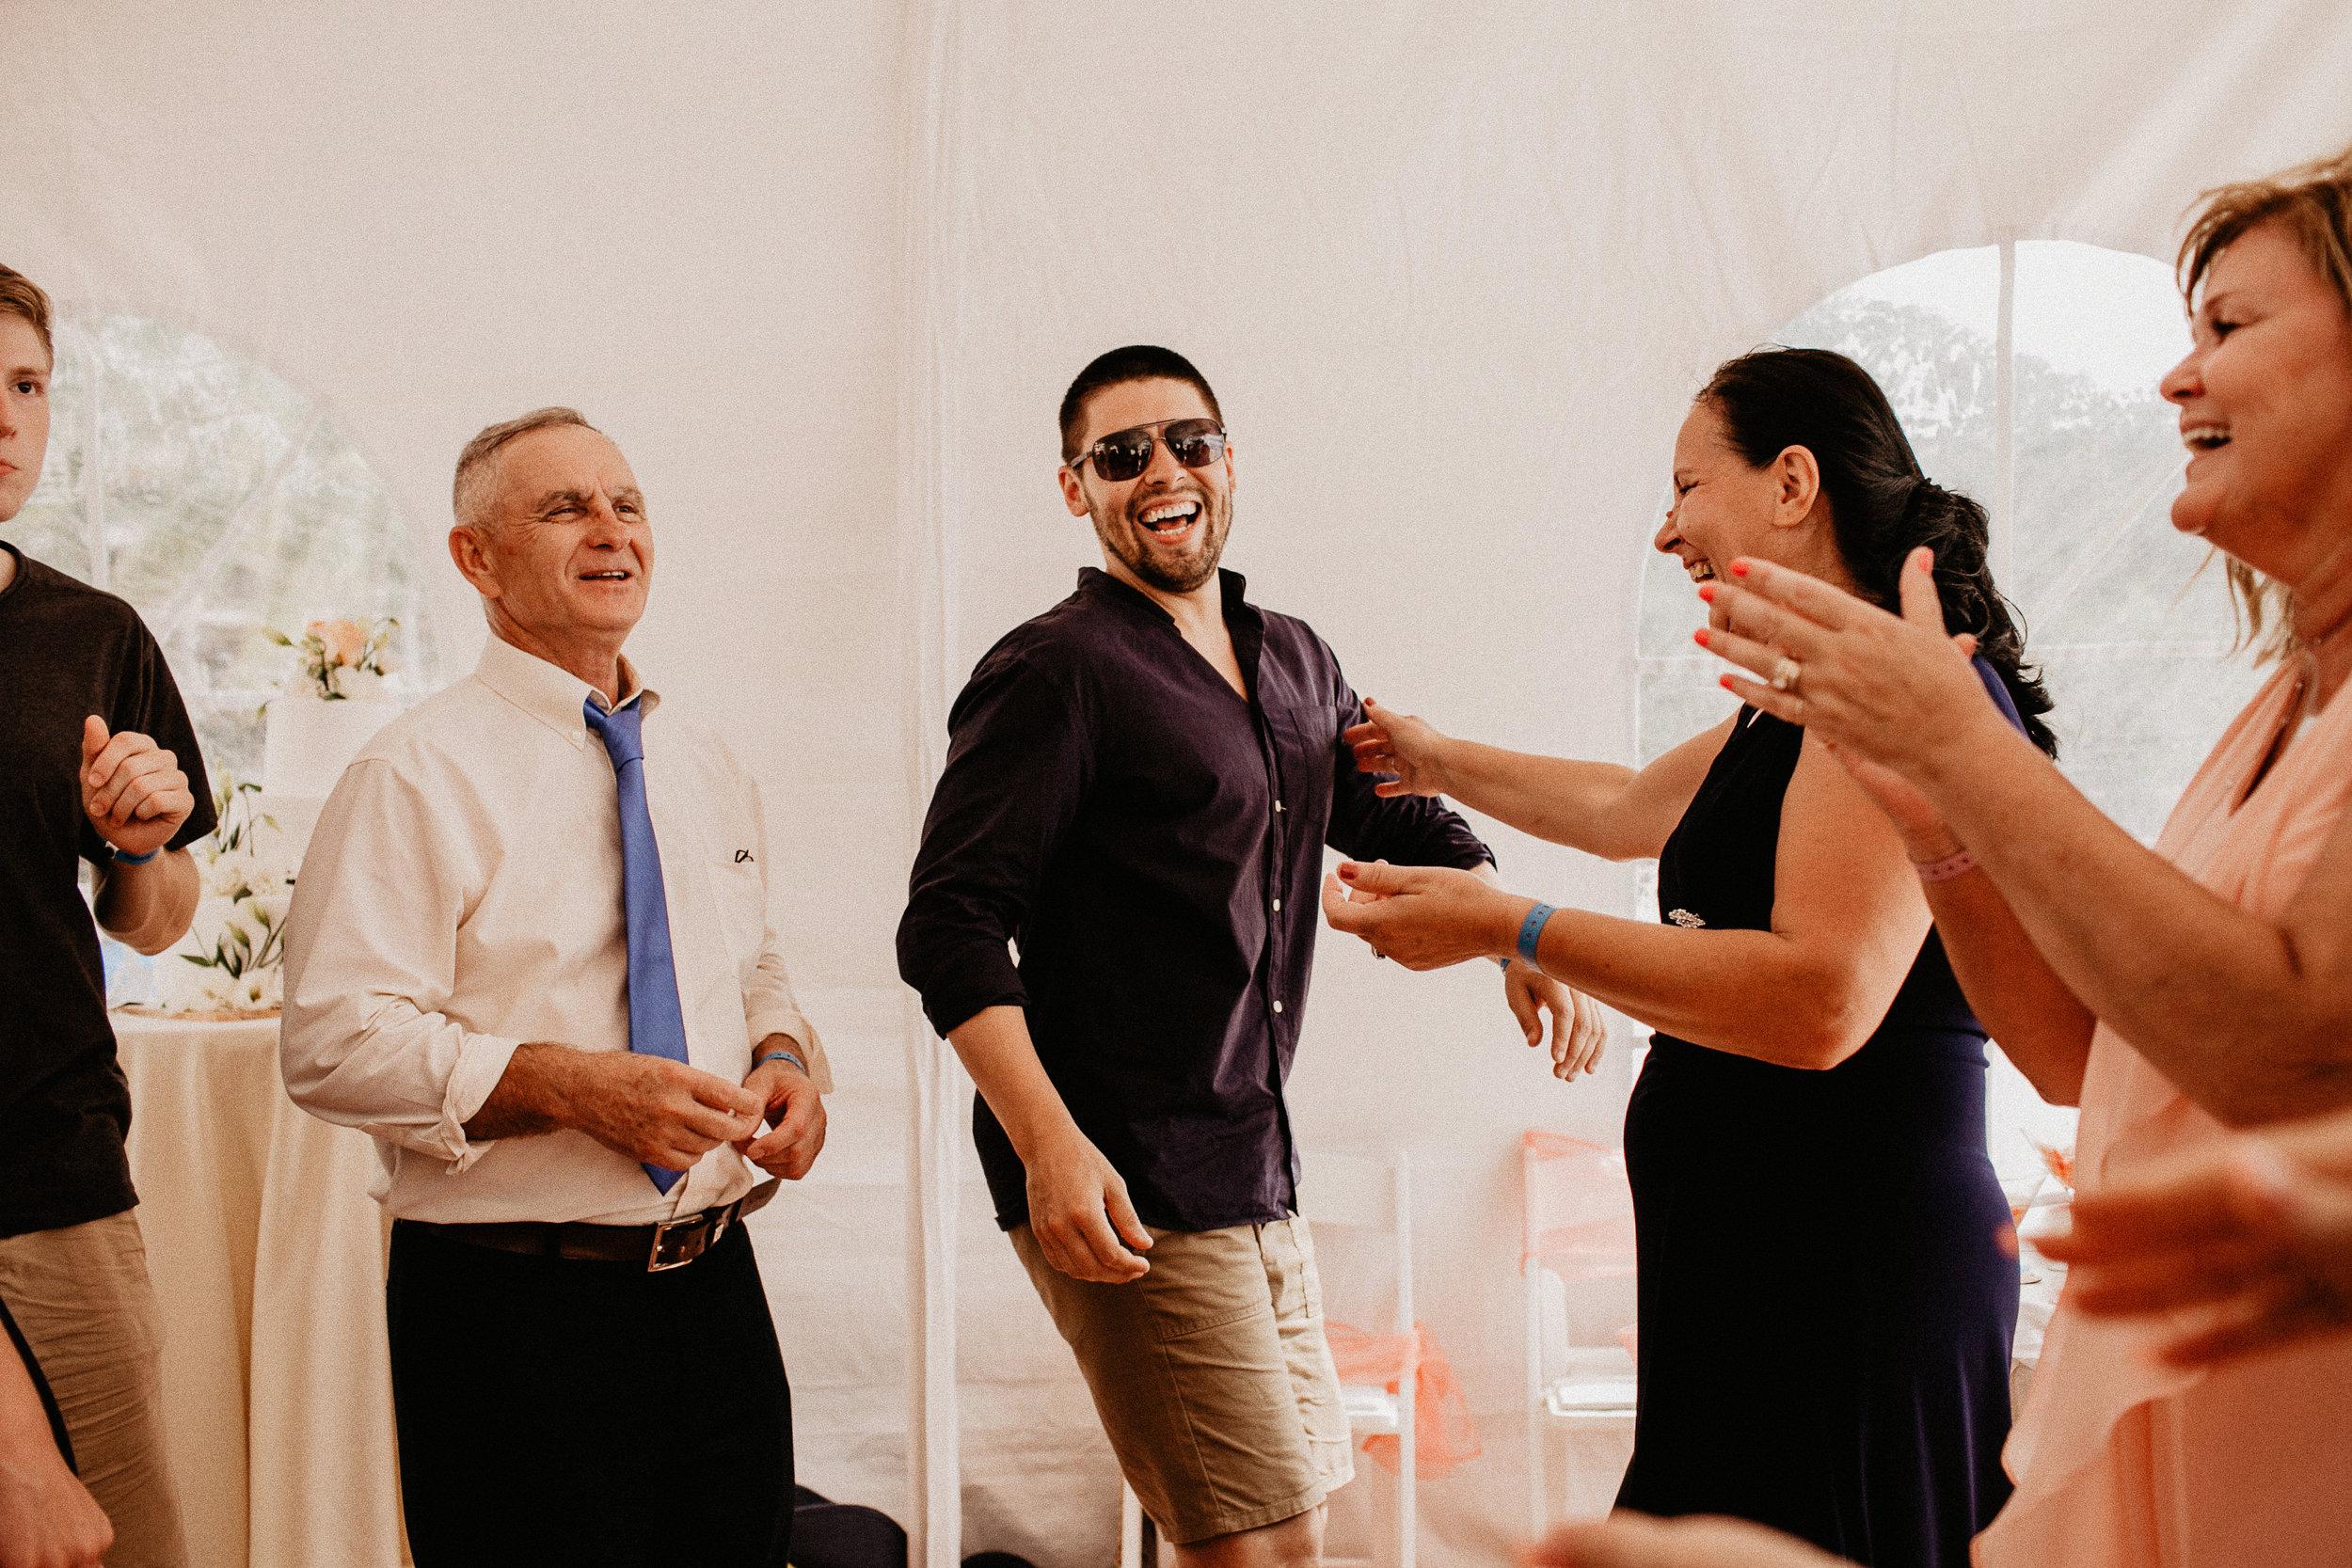 alfonso_flores_destination_wedding_photography_puerto_vallarta_hotel_barcelo_vallarta_cuttler_amela-512.JPG